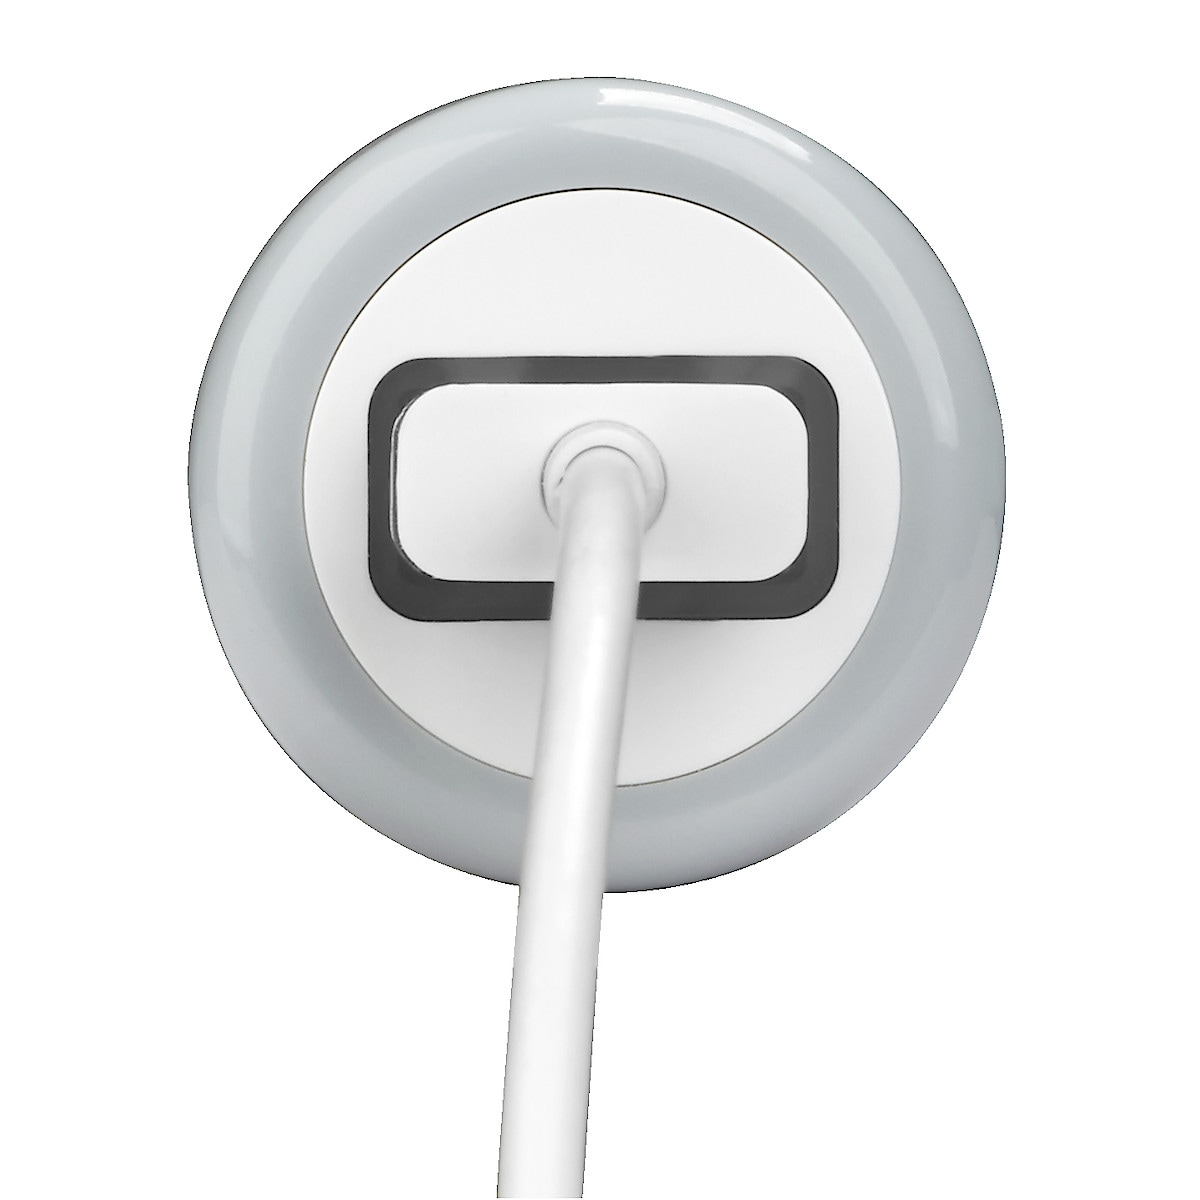 Exibel 12 V Lightning Charger for iPod/iPhone/iPad